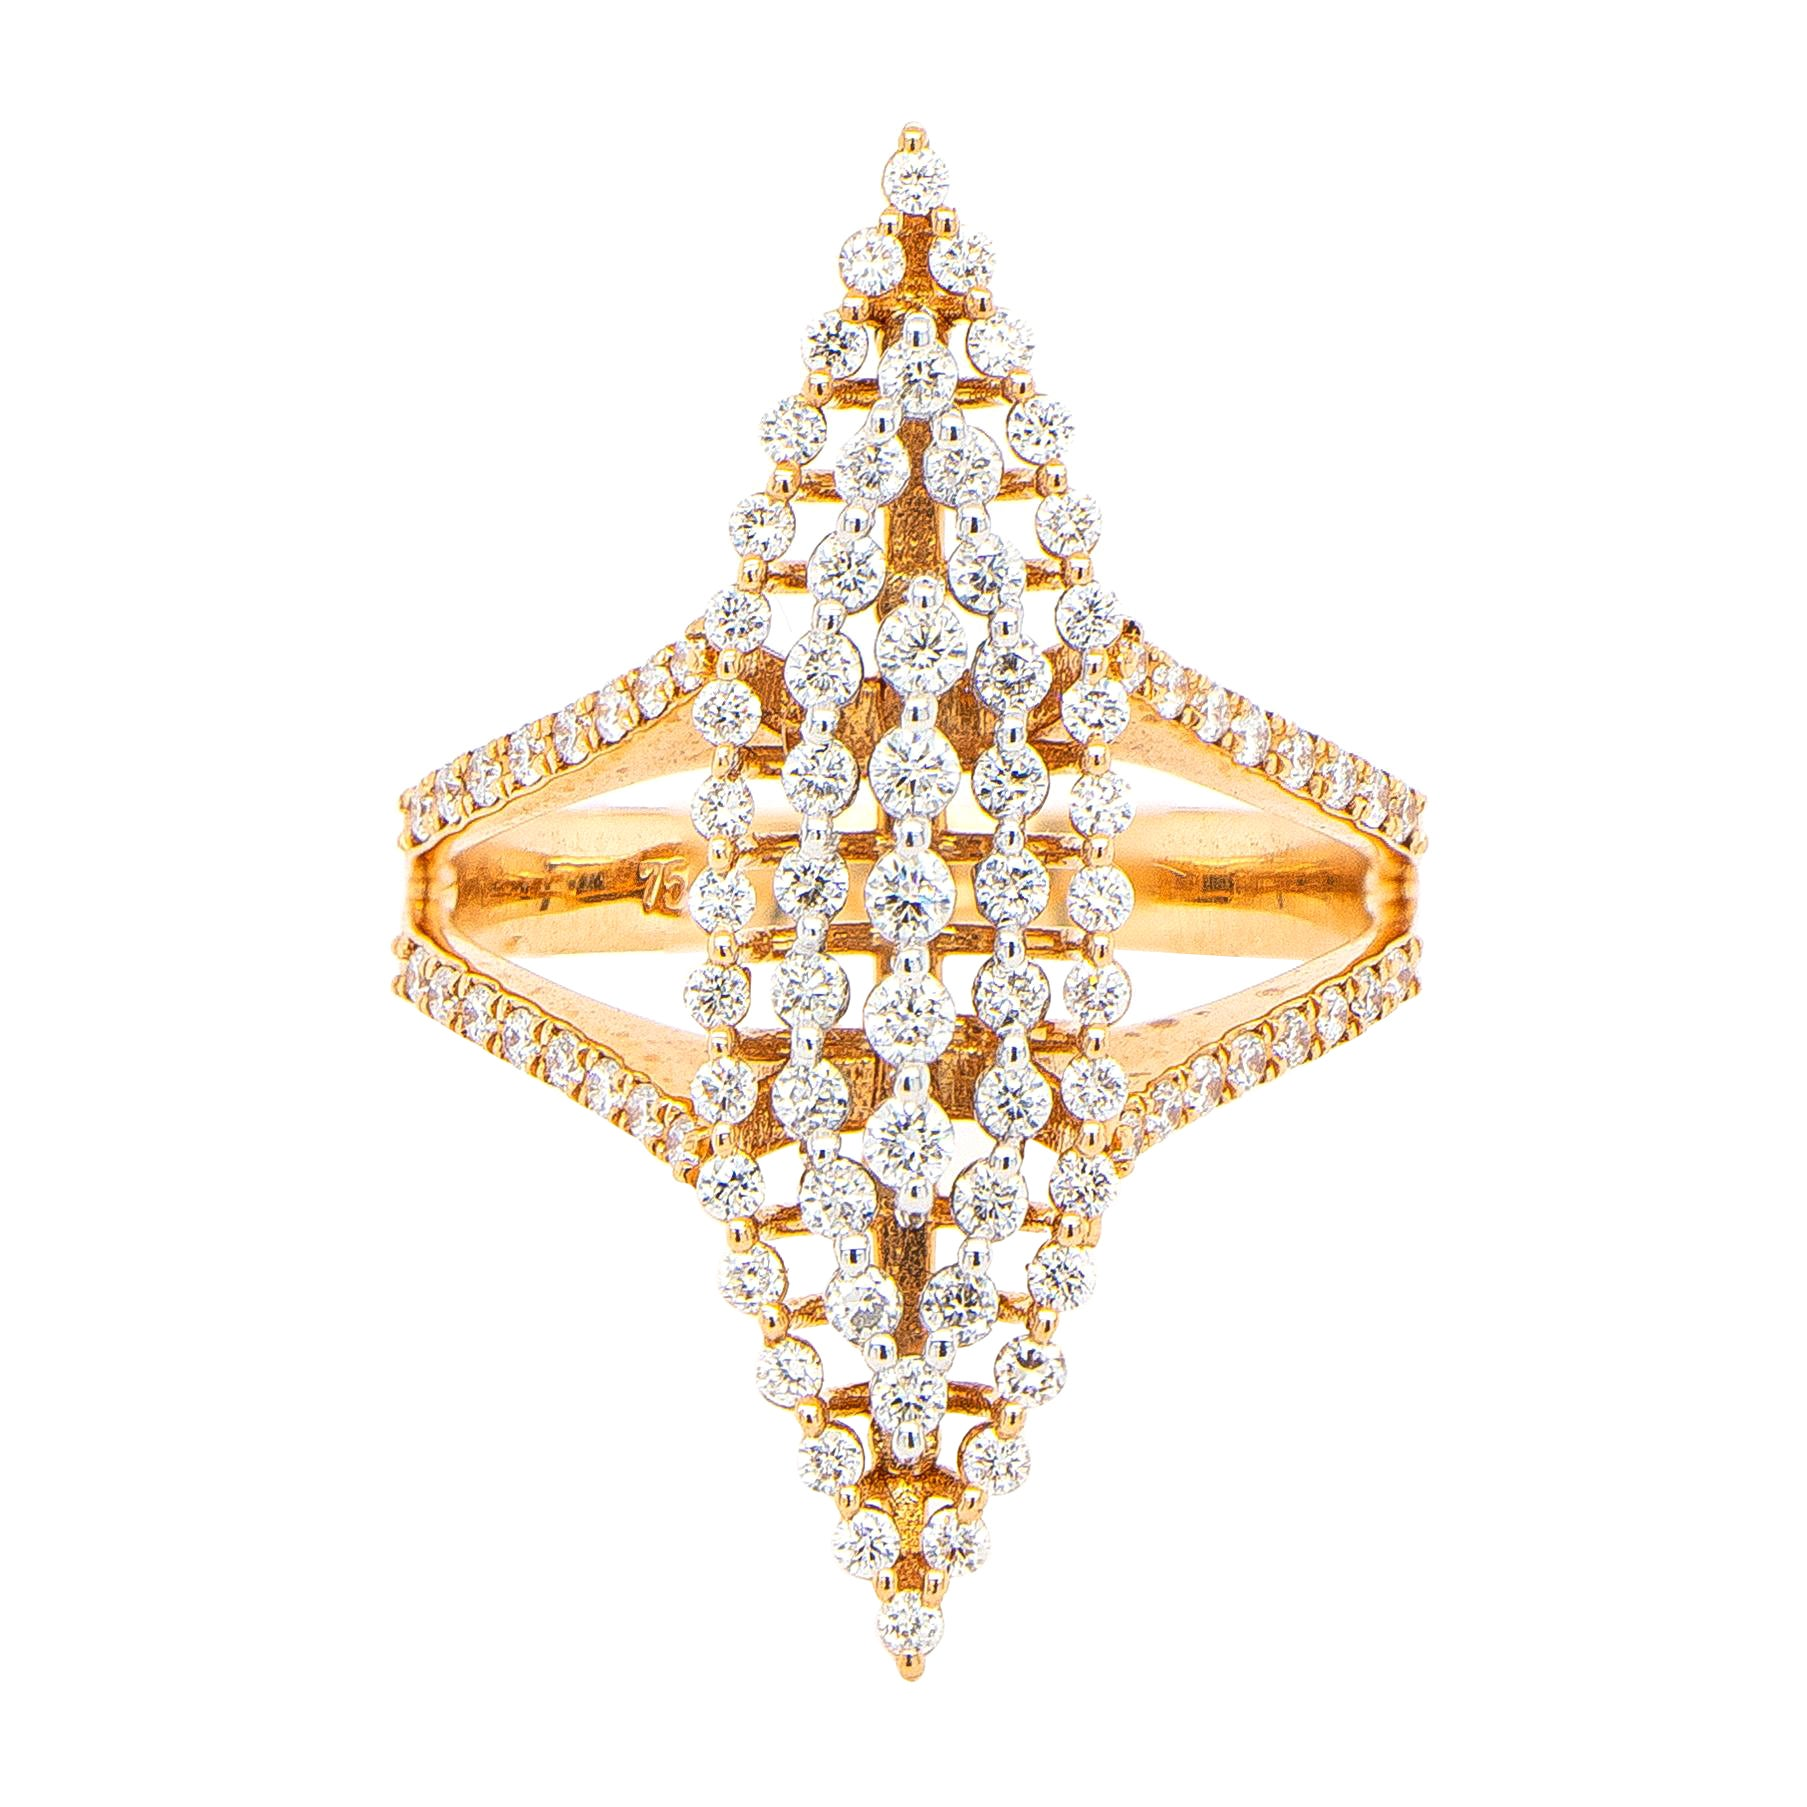 Diamond Cocktail Ring 0.64 Carats 18K Rose Gold